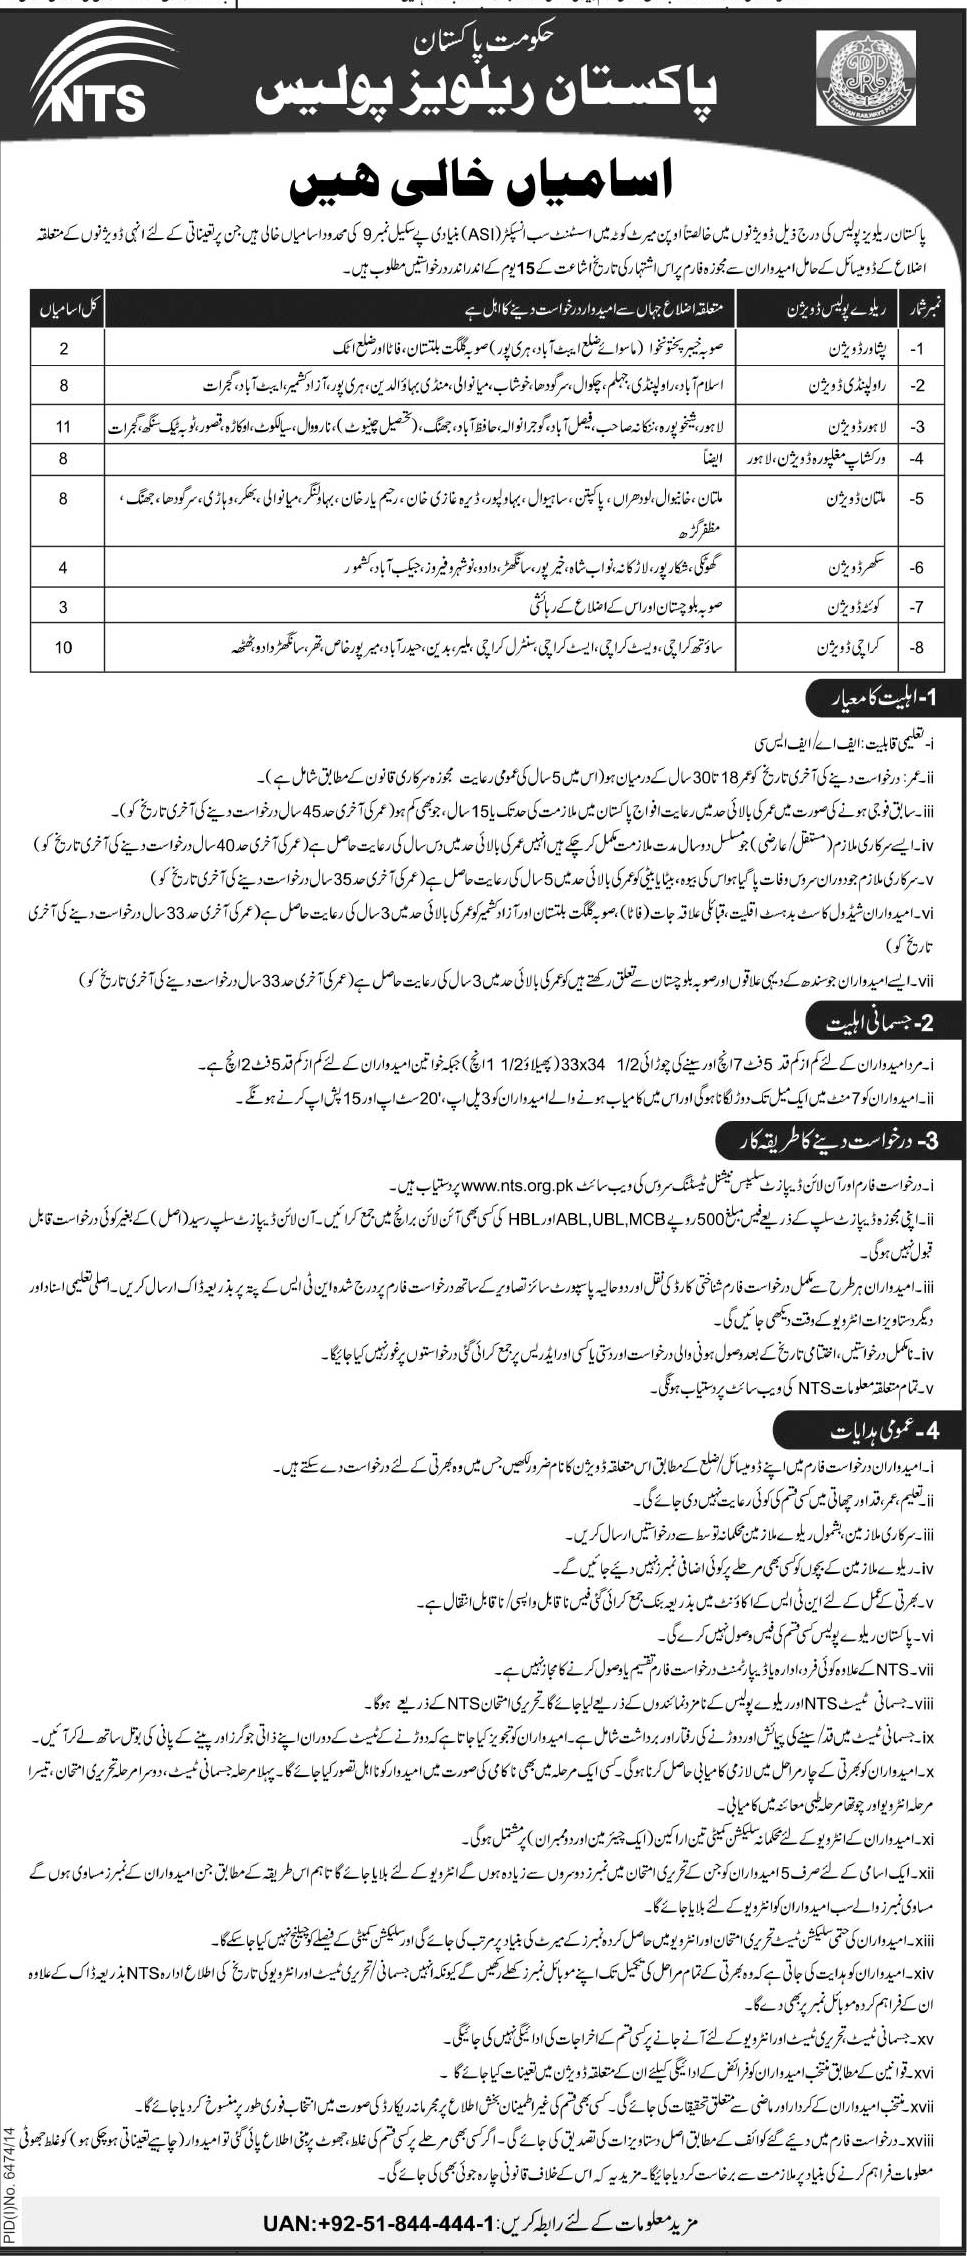 Pakistan Railway Police ASI Jobs 2015 Application Form, Test Syllabus